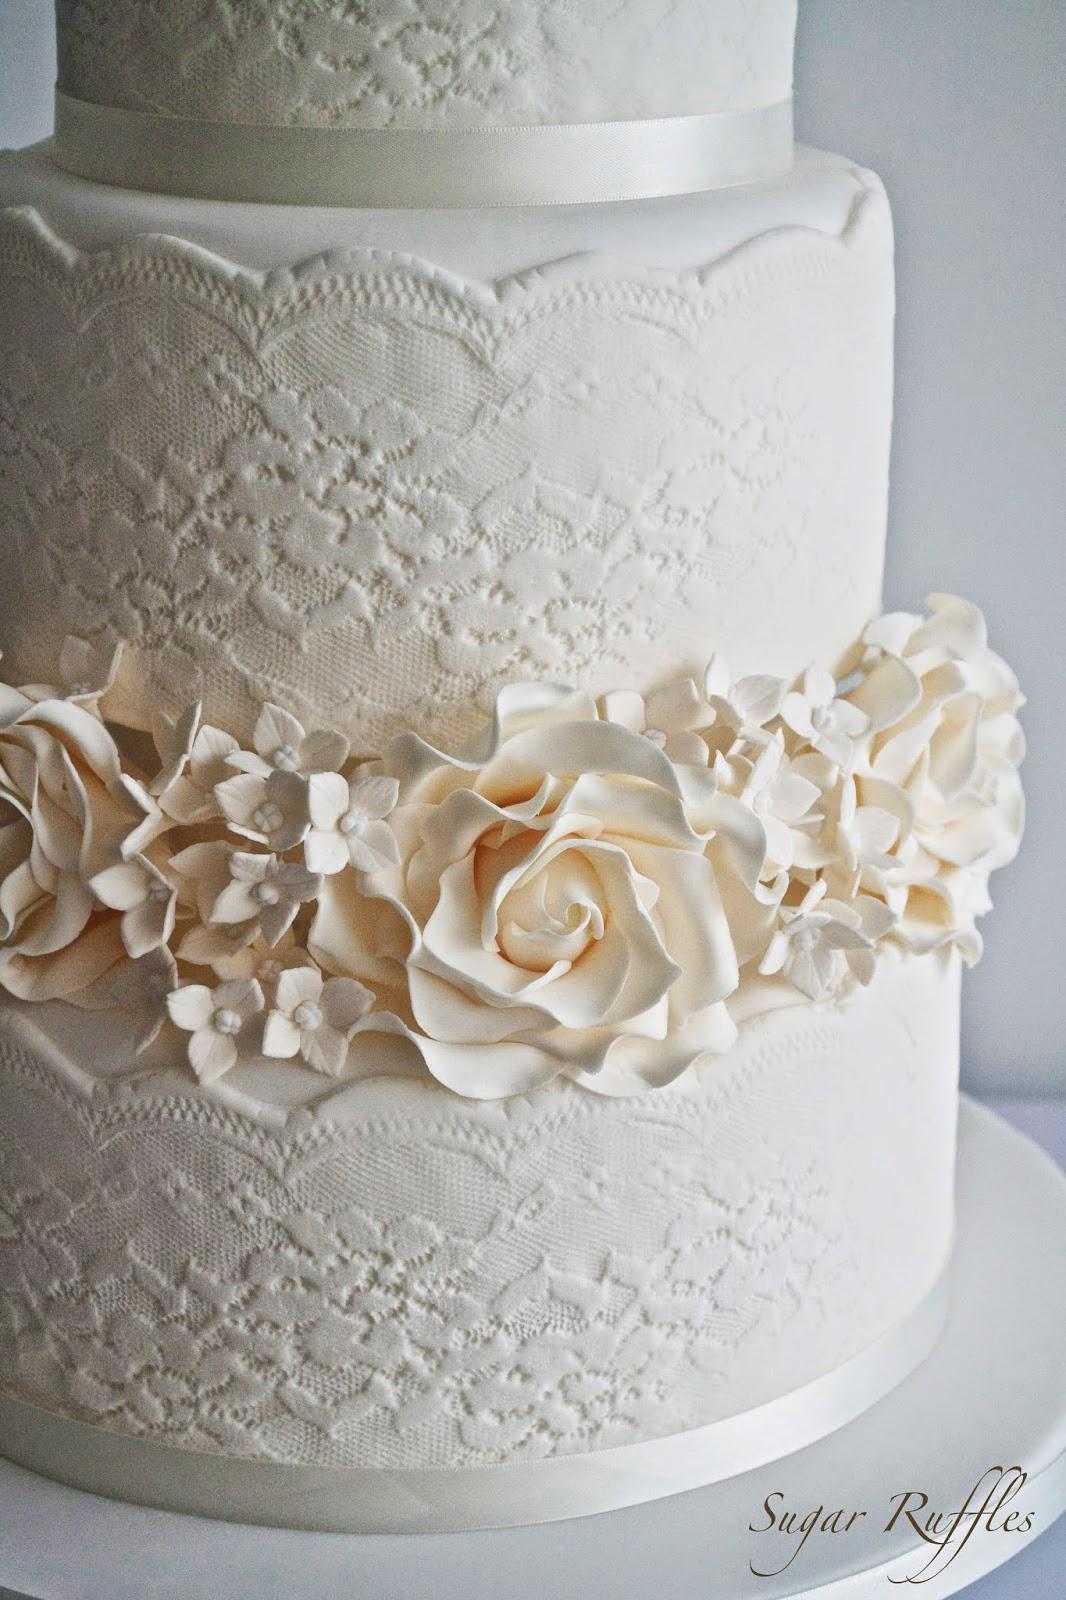 Lace Wedding Cake With Roses & Hydrangea